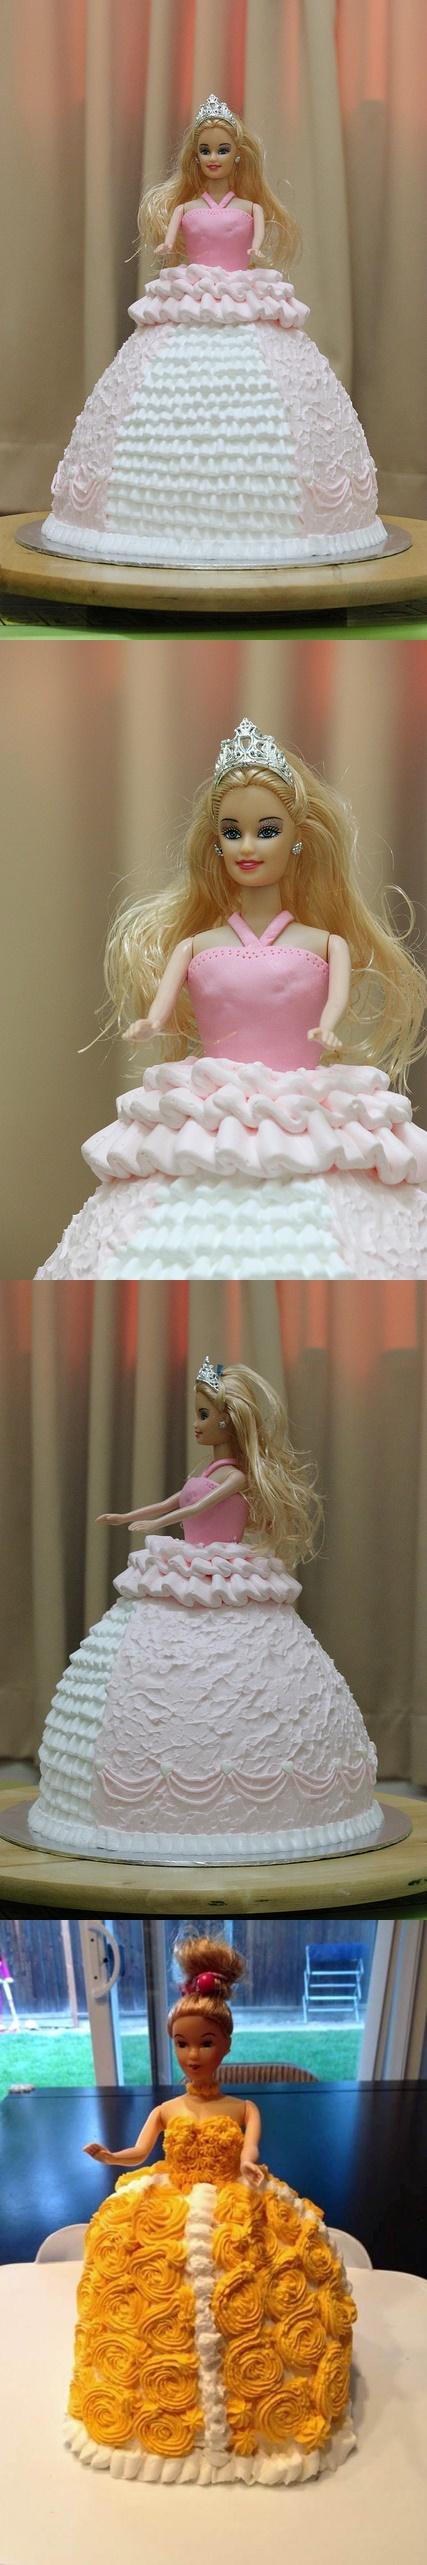 Babie cake m